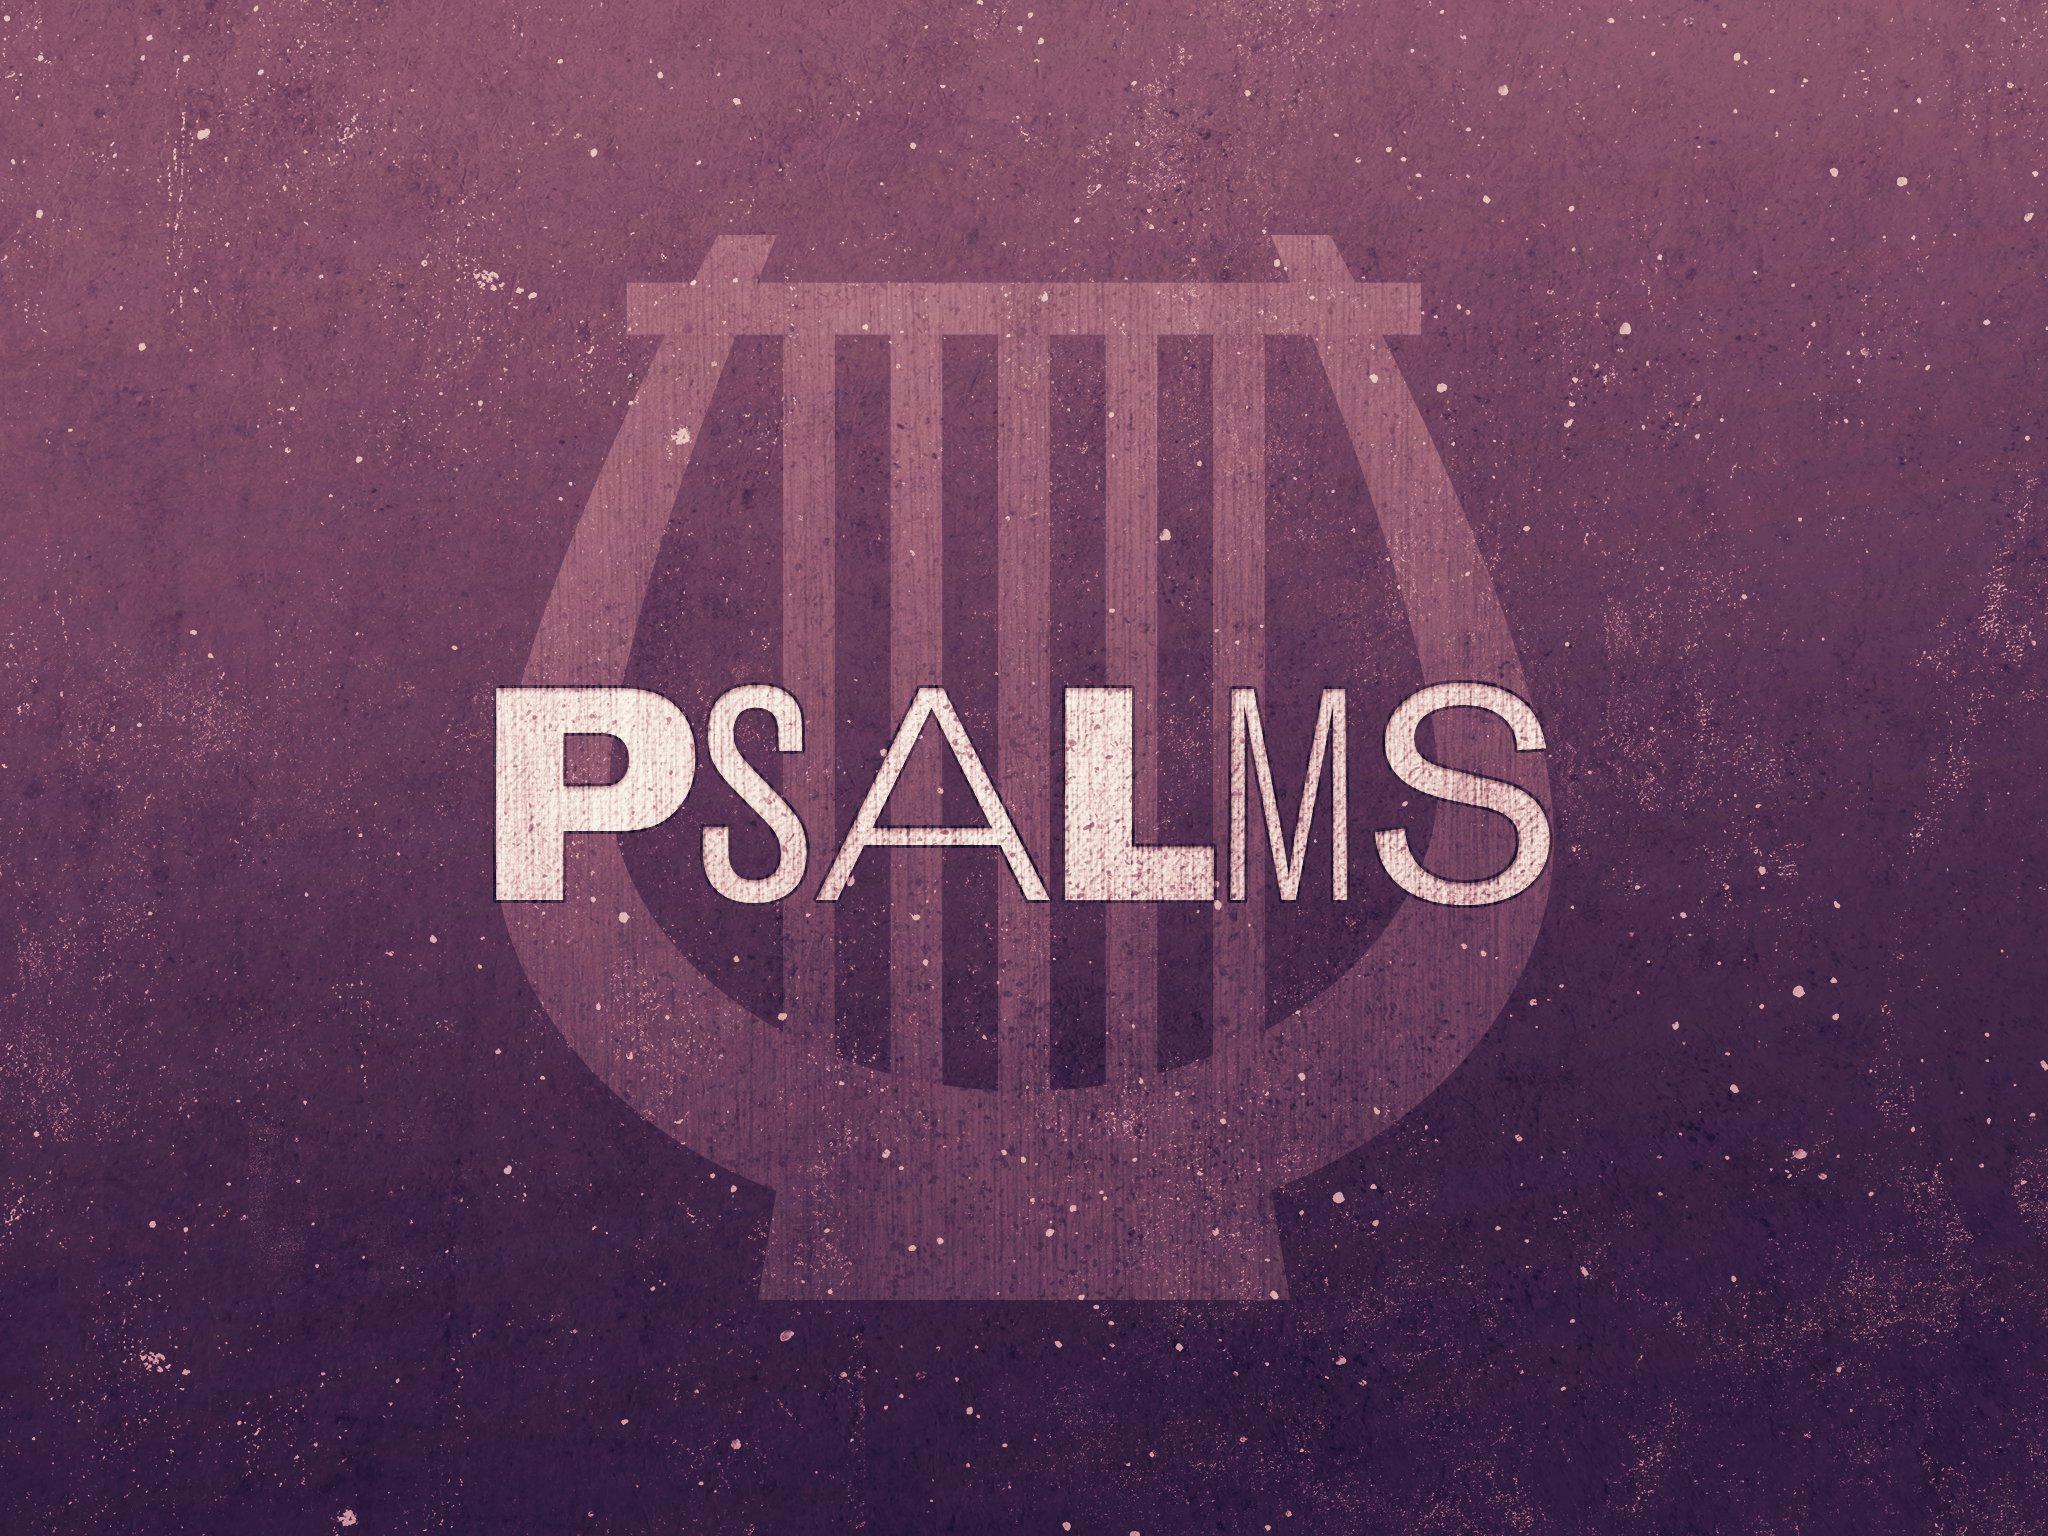 19-Psalms_Title_4x3-fullscreen.jpg